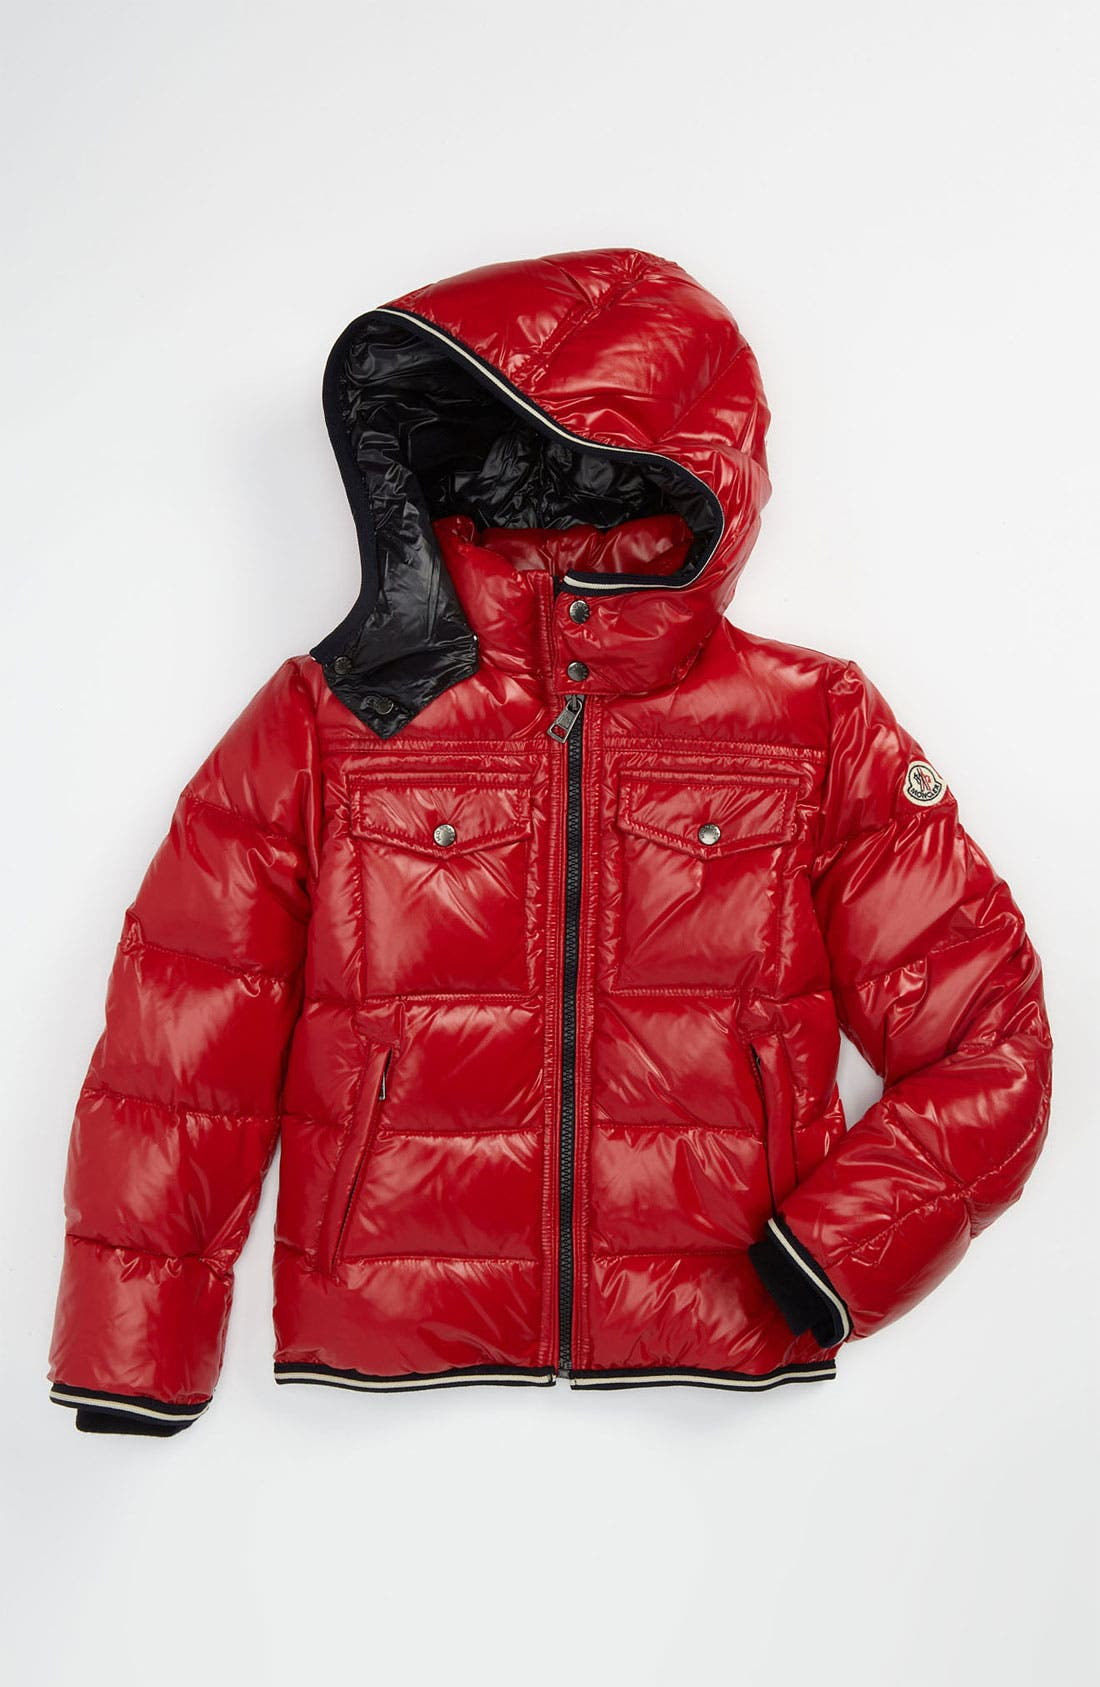 Alternate Image 1 Selected - Moncler Puffer Jacket (Little Boys)